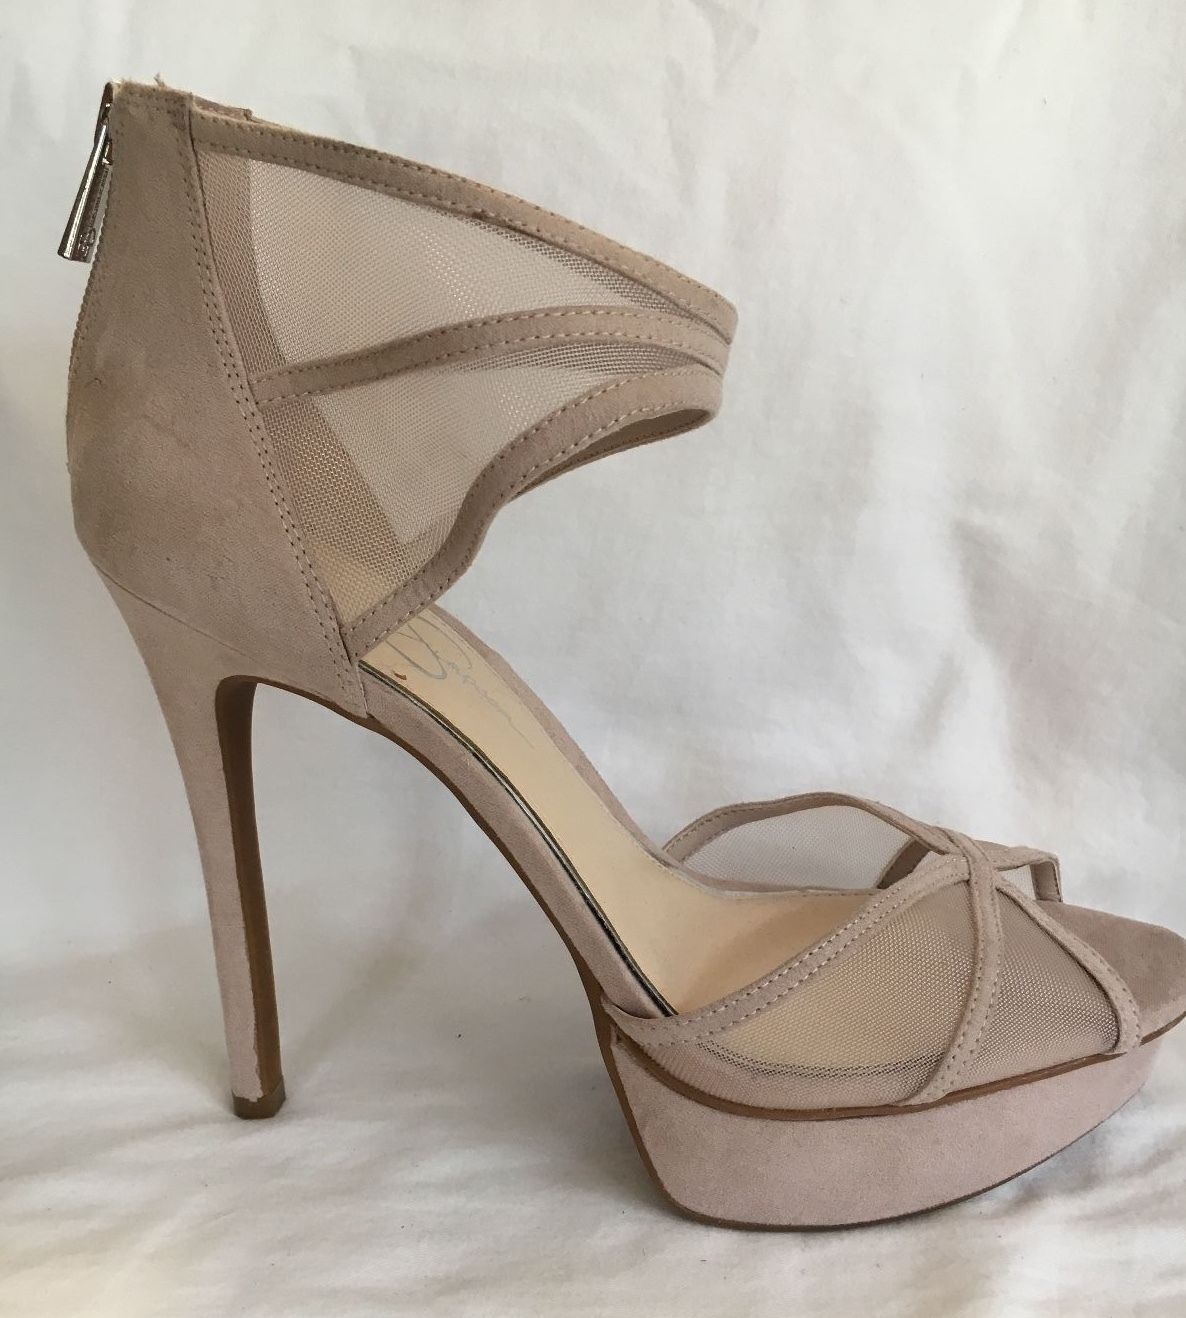 68d23fab50c1 JESSICA SIMPSON Rose  Lt Pinkish Cream Beige High Sexy Open Toe Heels Size  10 40